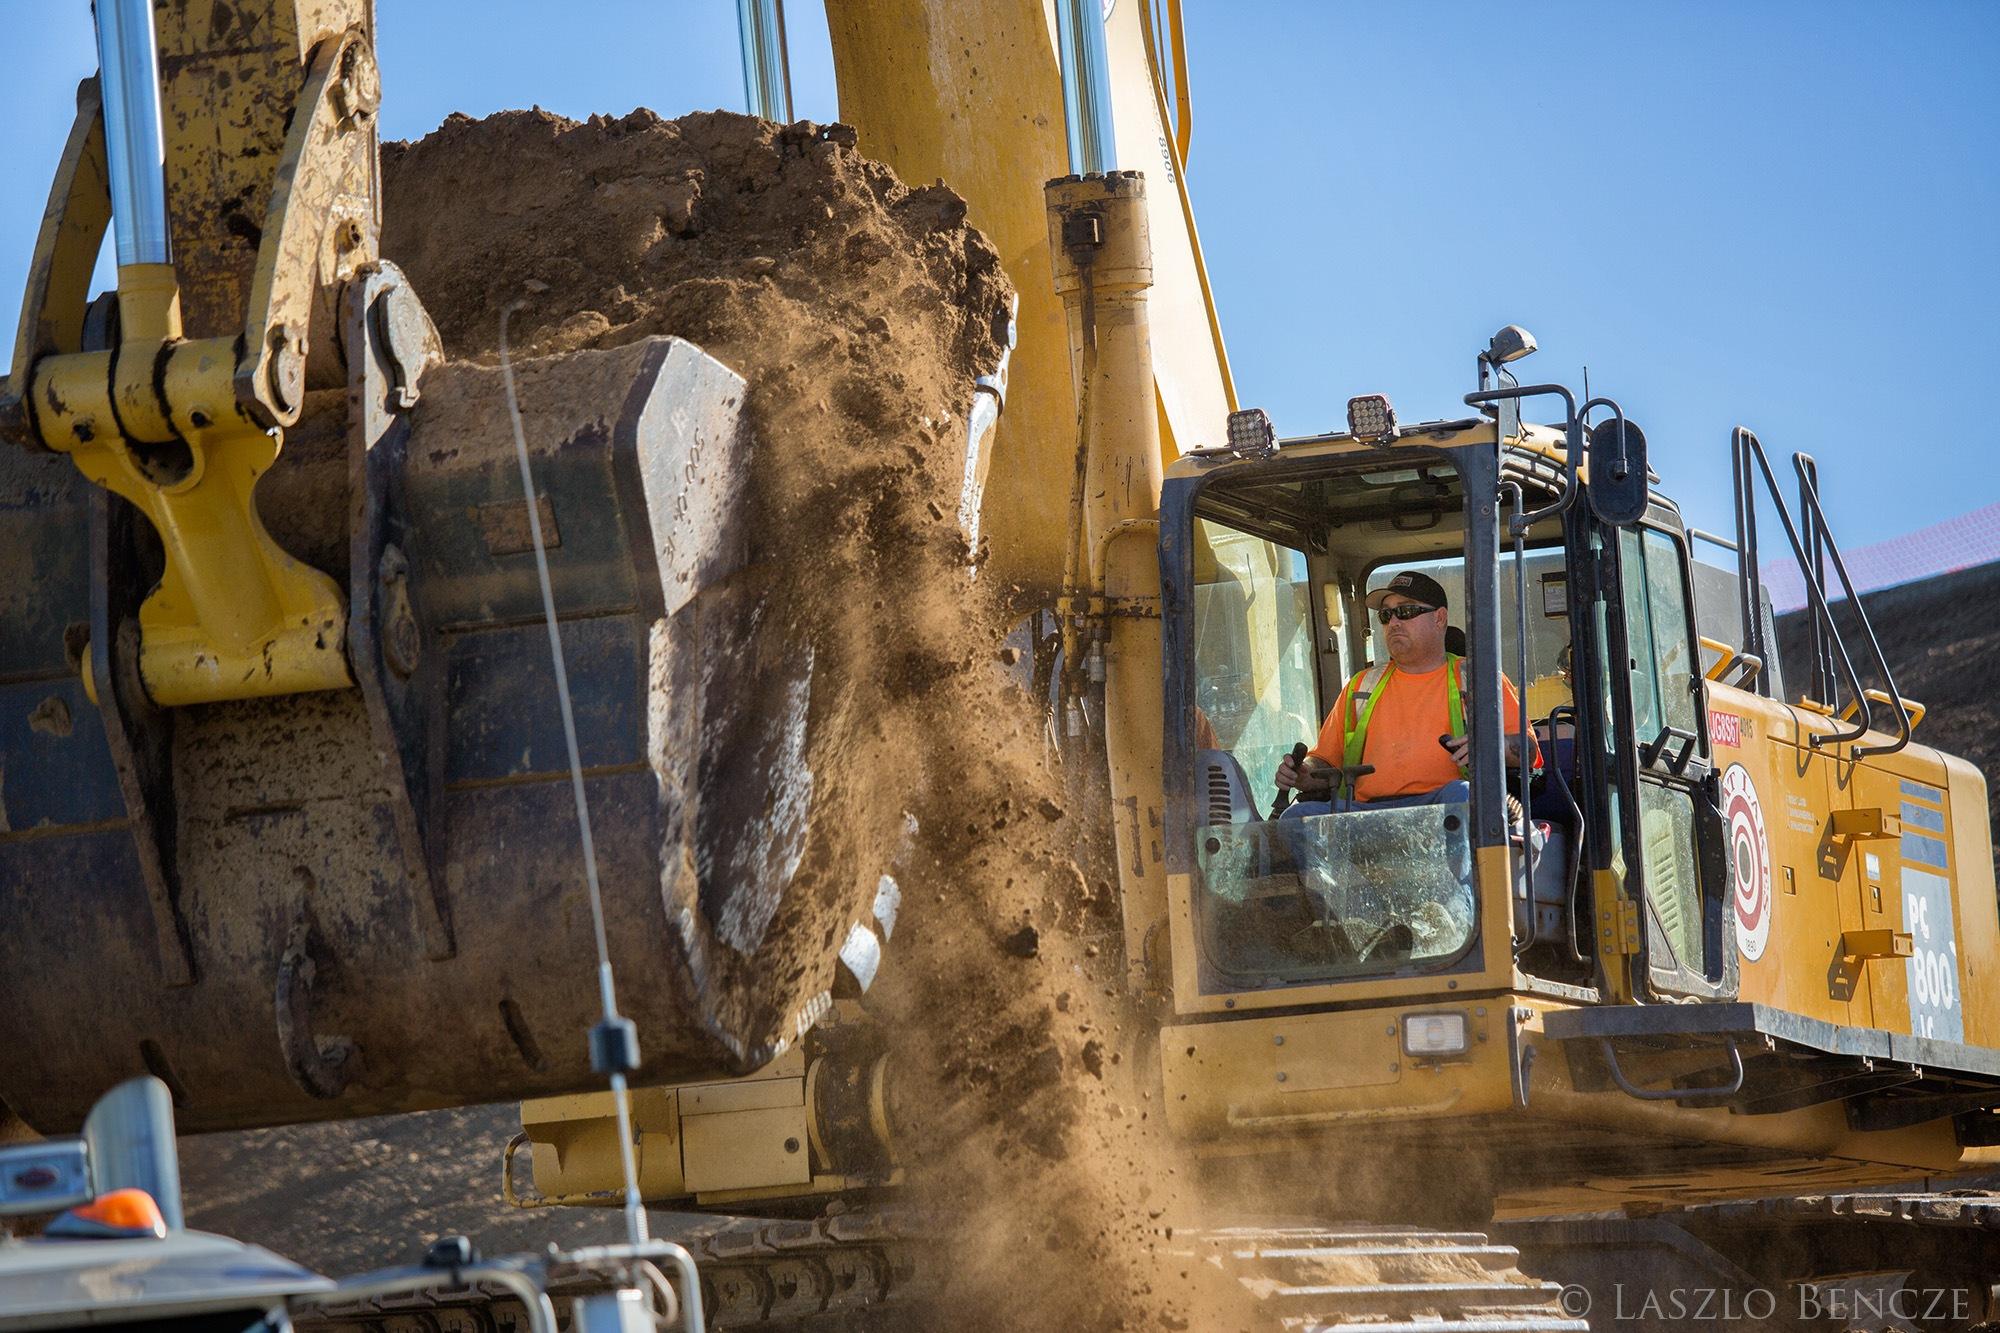 Excavator Operator, v2 by Laszlo Bencze